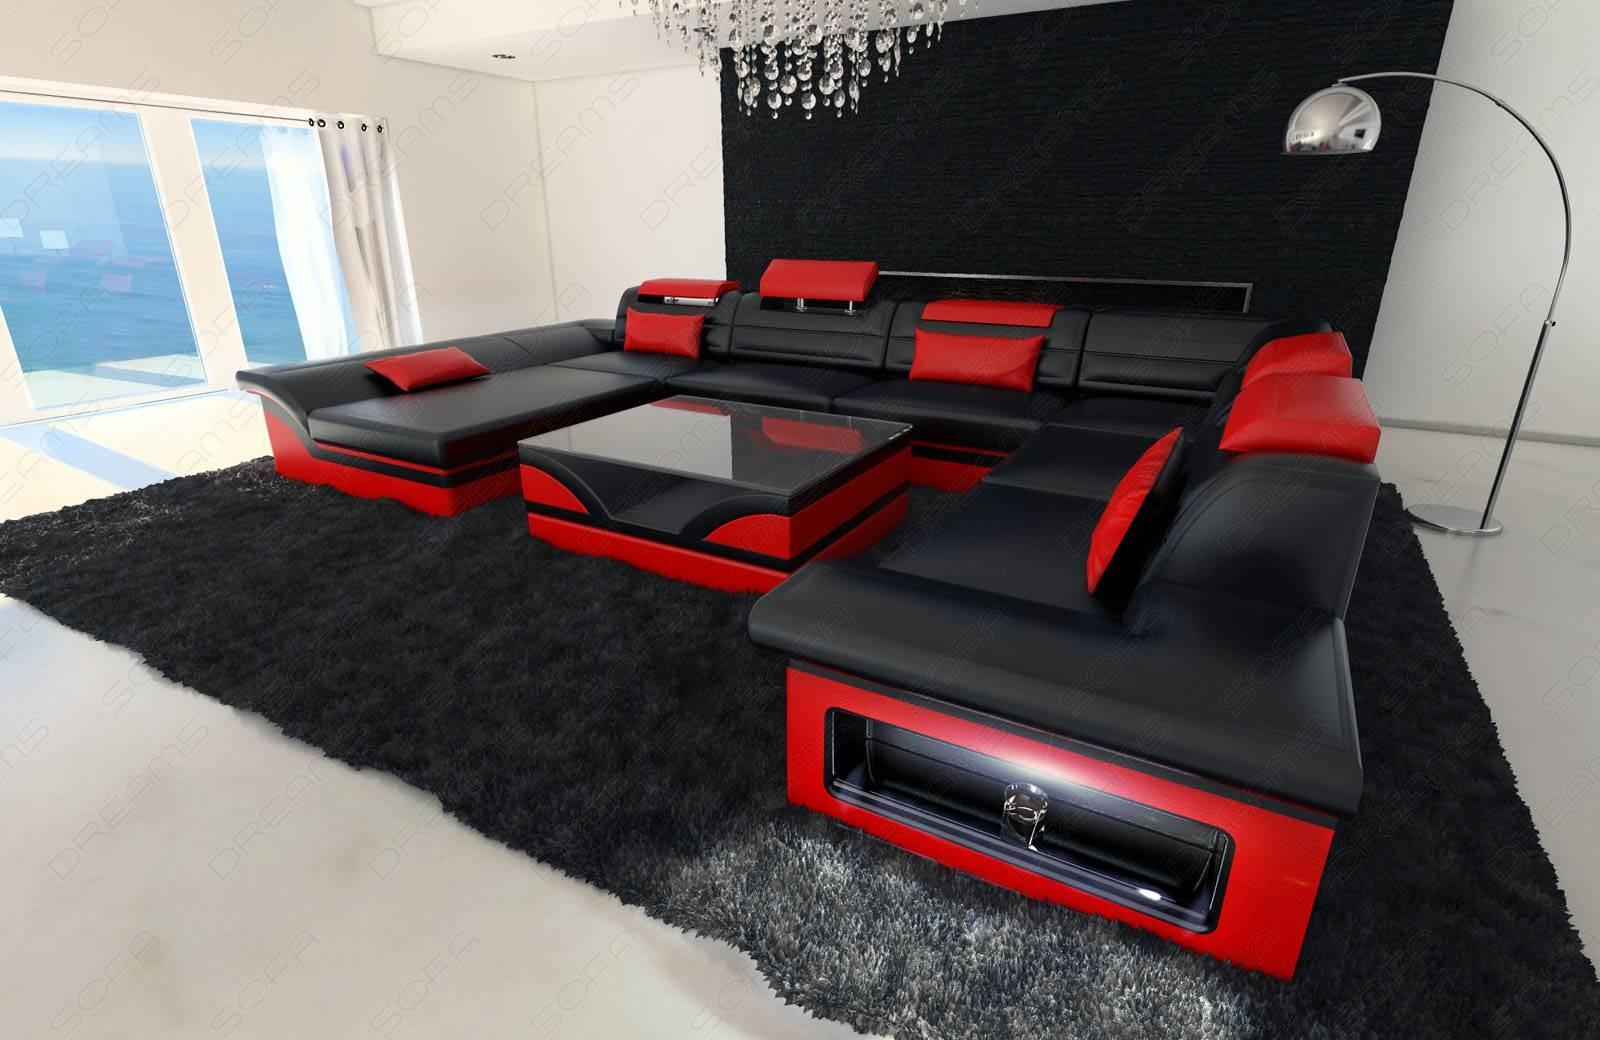 Leather Sectional Sofa Enzo Xxl Black Red | Ebay for Red Black Sectional Sofa (Image 16 of 30)